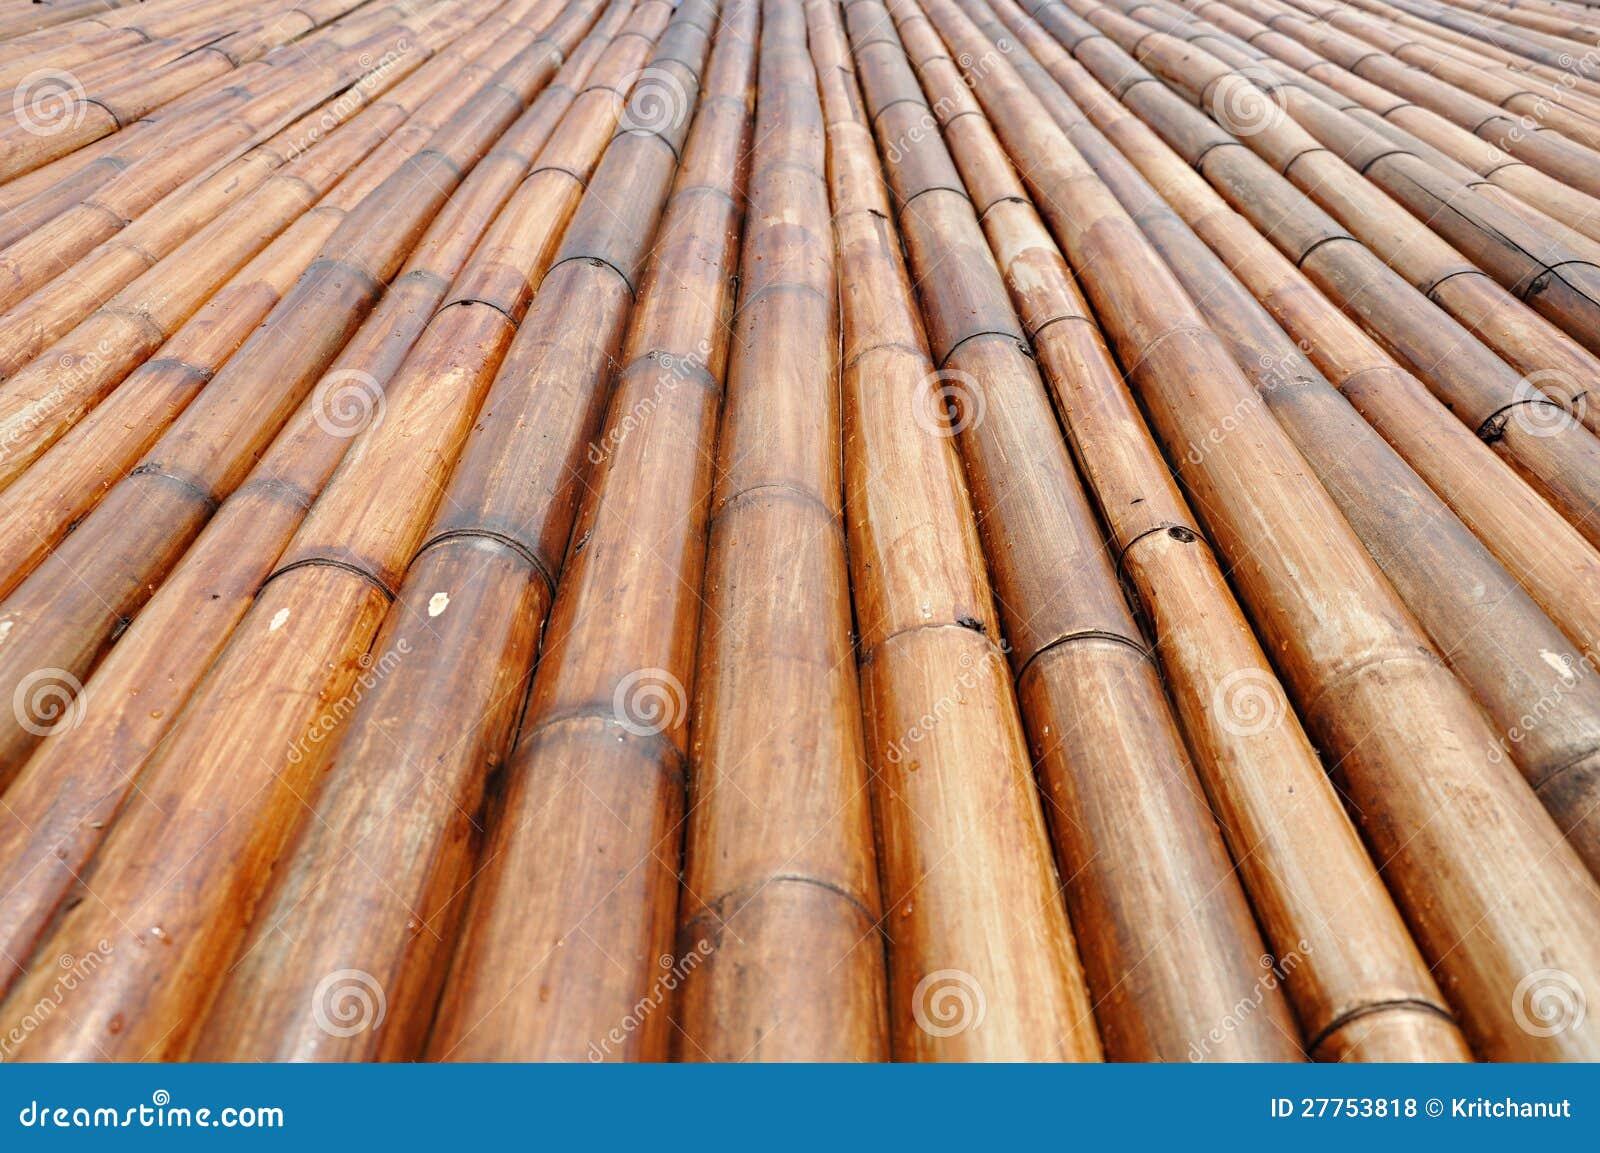 Dry bamboo stalk wall royalty free stock photo